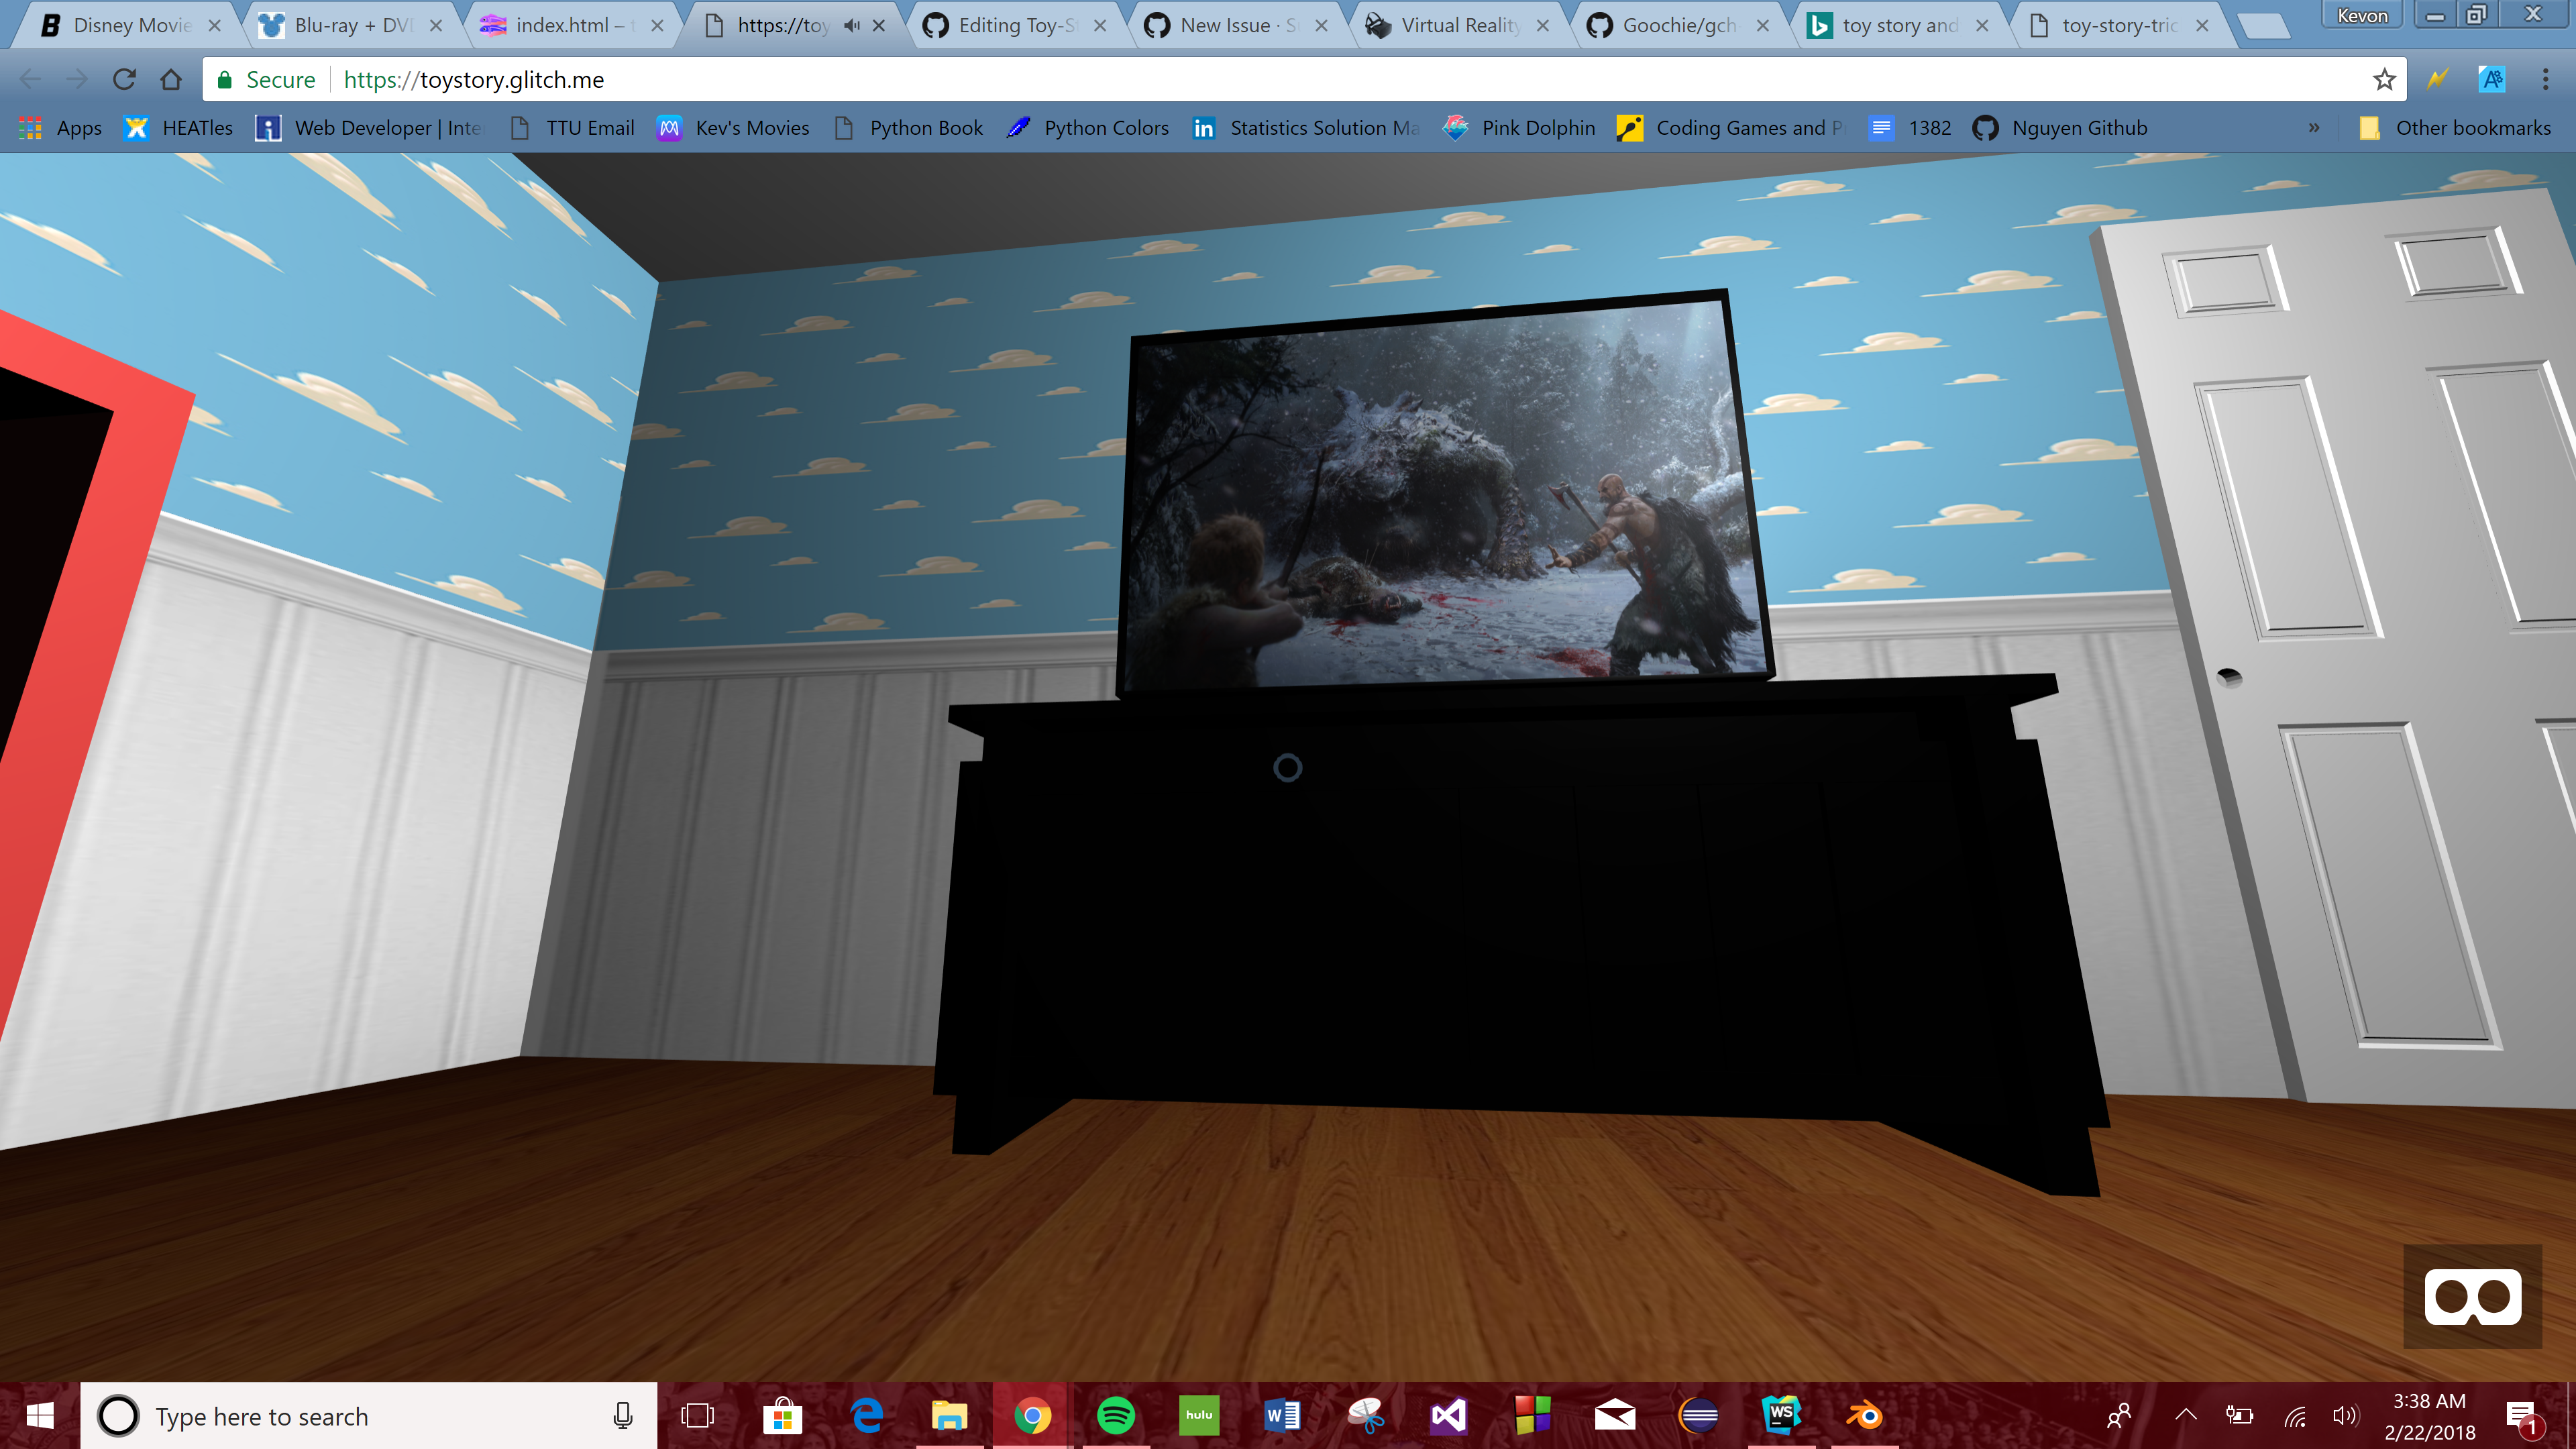 GitHub - SuperDuperKev/Toy-Story: VR model of Andy's Room